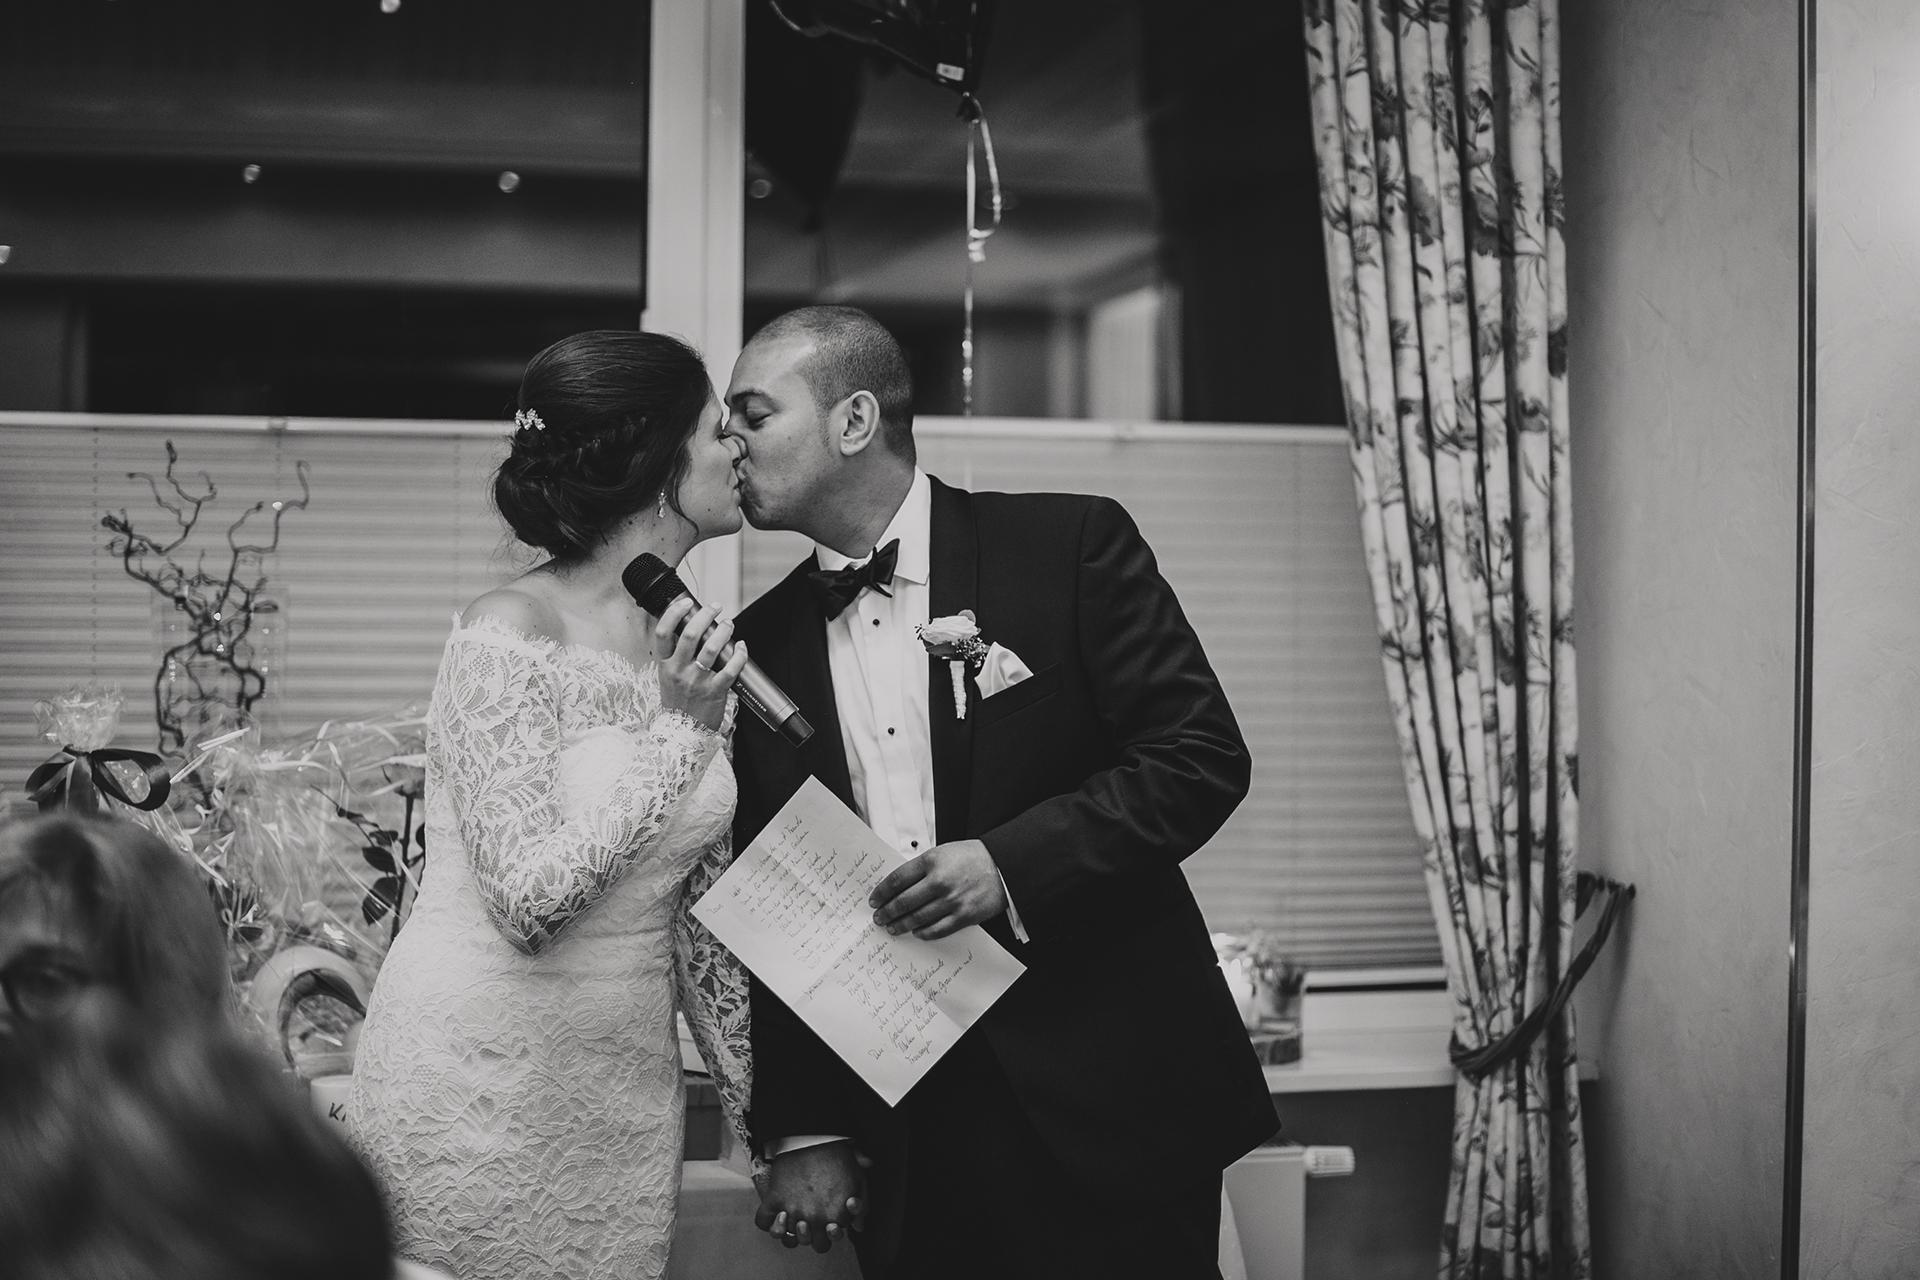 Hochzeitsreportage_J&D_100_Caroline Queda Fotografie